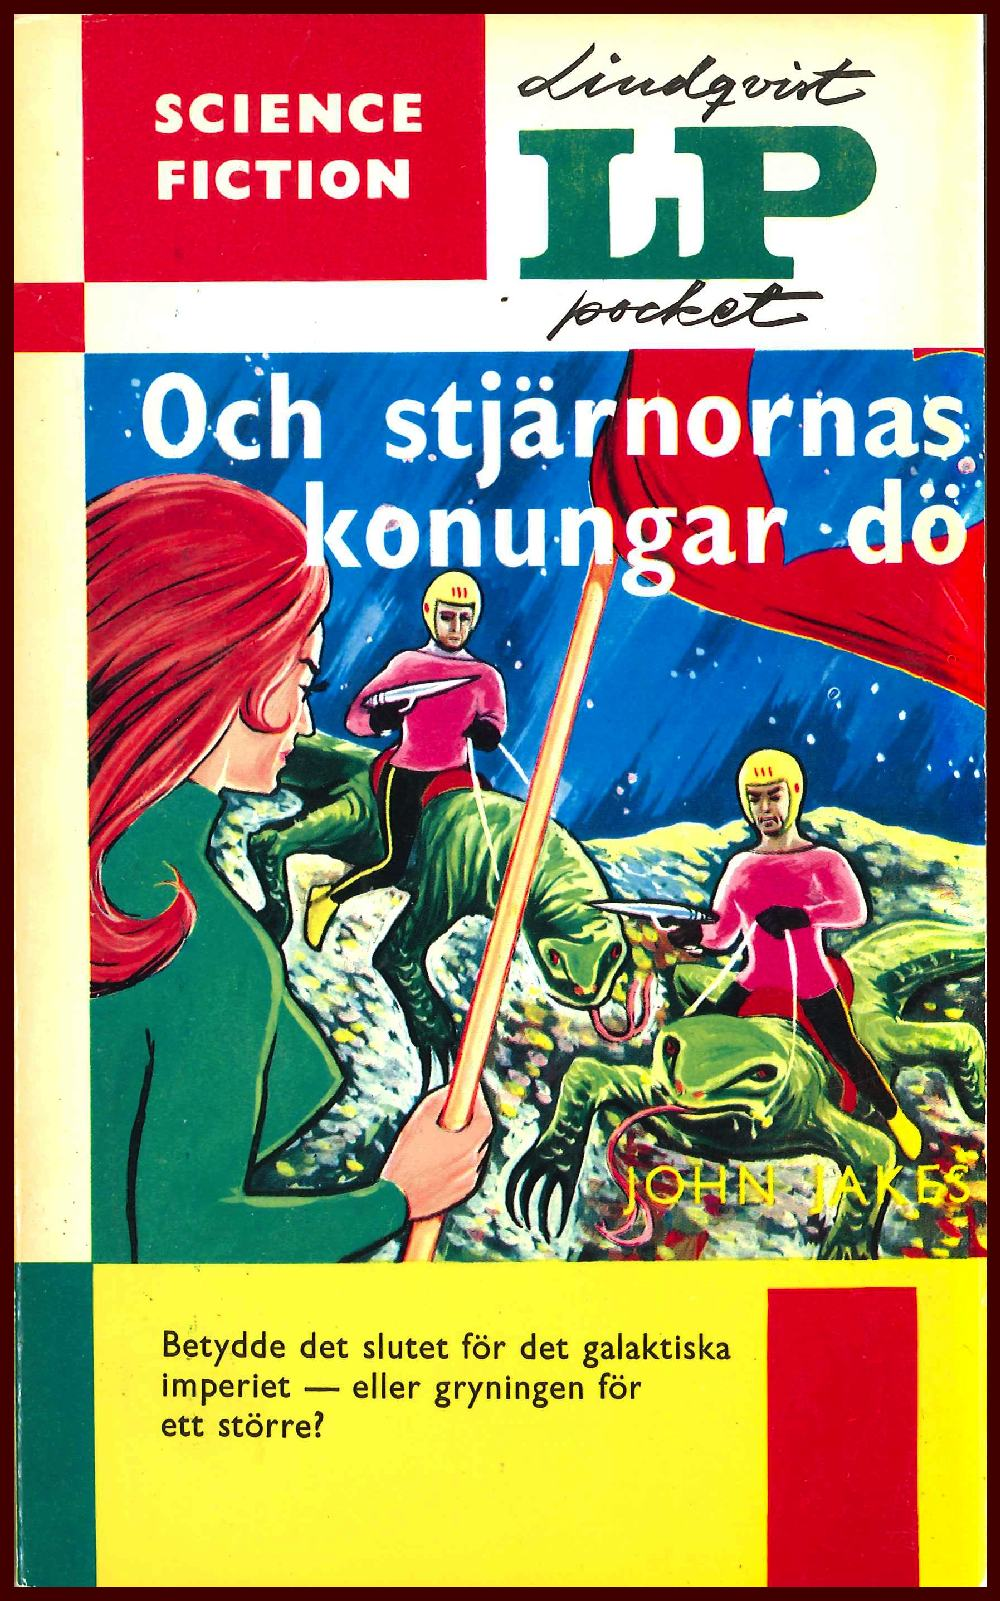 The Swedish Olympic Salamander Dressage Team